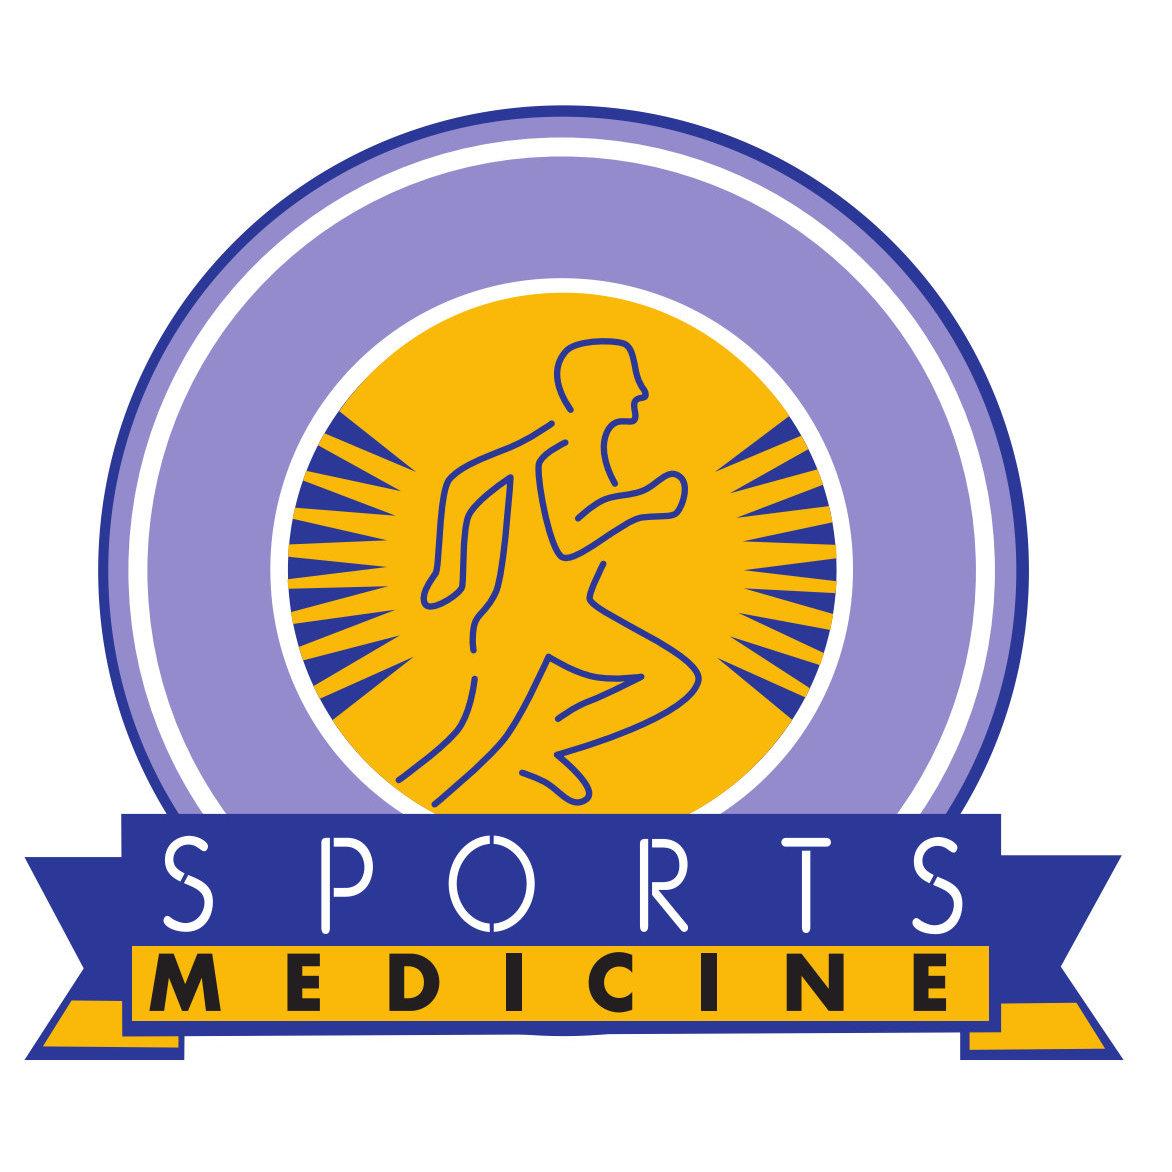 Greater Michigan Orthopaedics & Sports Medicine